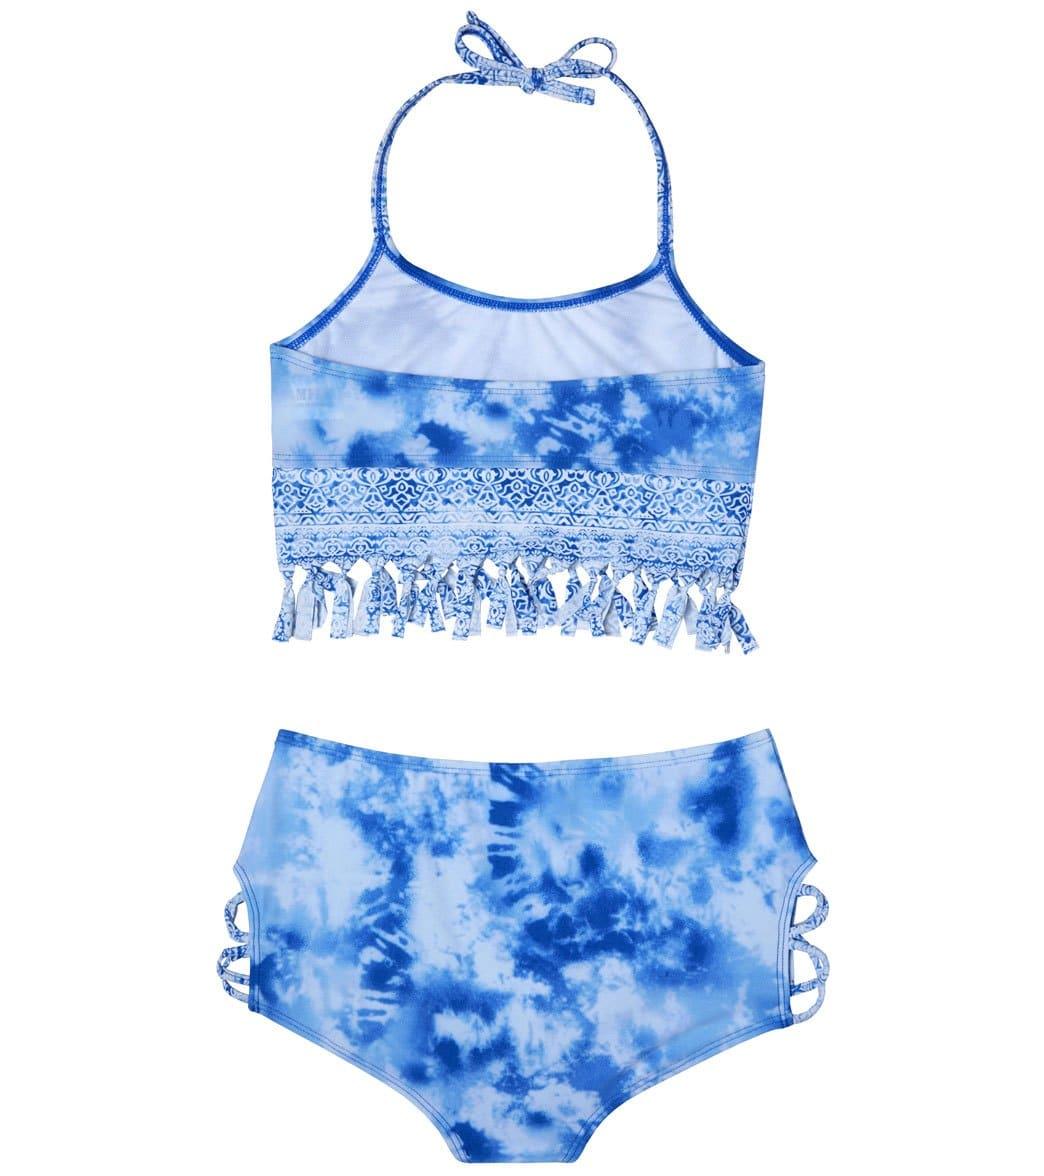 ed2bf4c375 Gossip Girls' Jean Addiction Two Piece Bikini Set (Big Kid) at ...